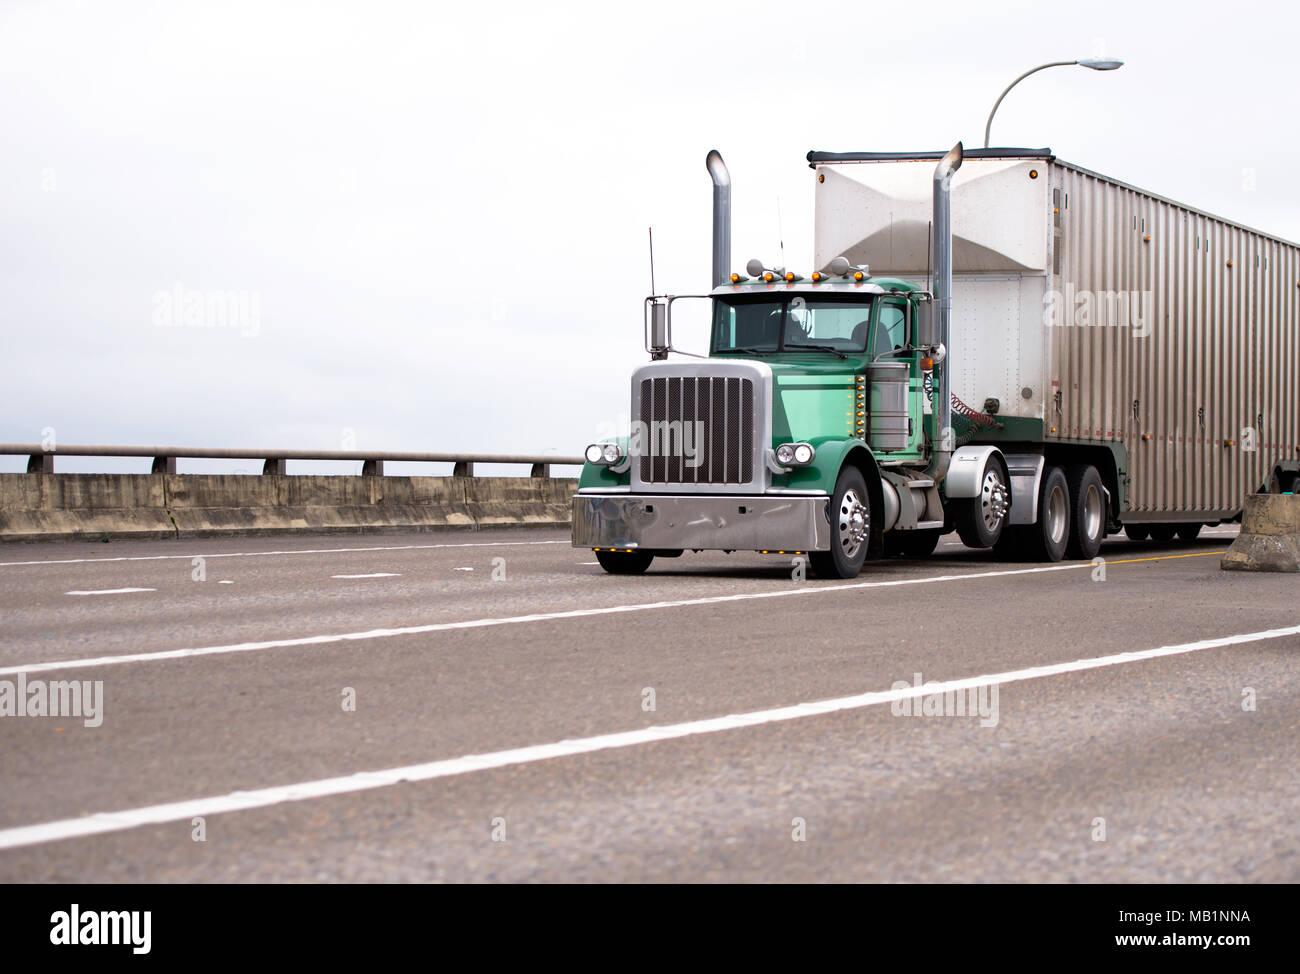 truck exhaust pipes stockfotos und